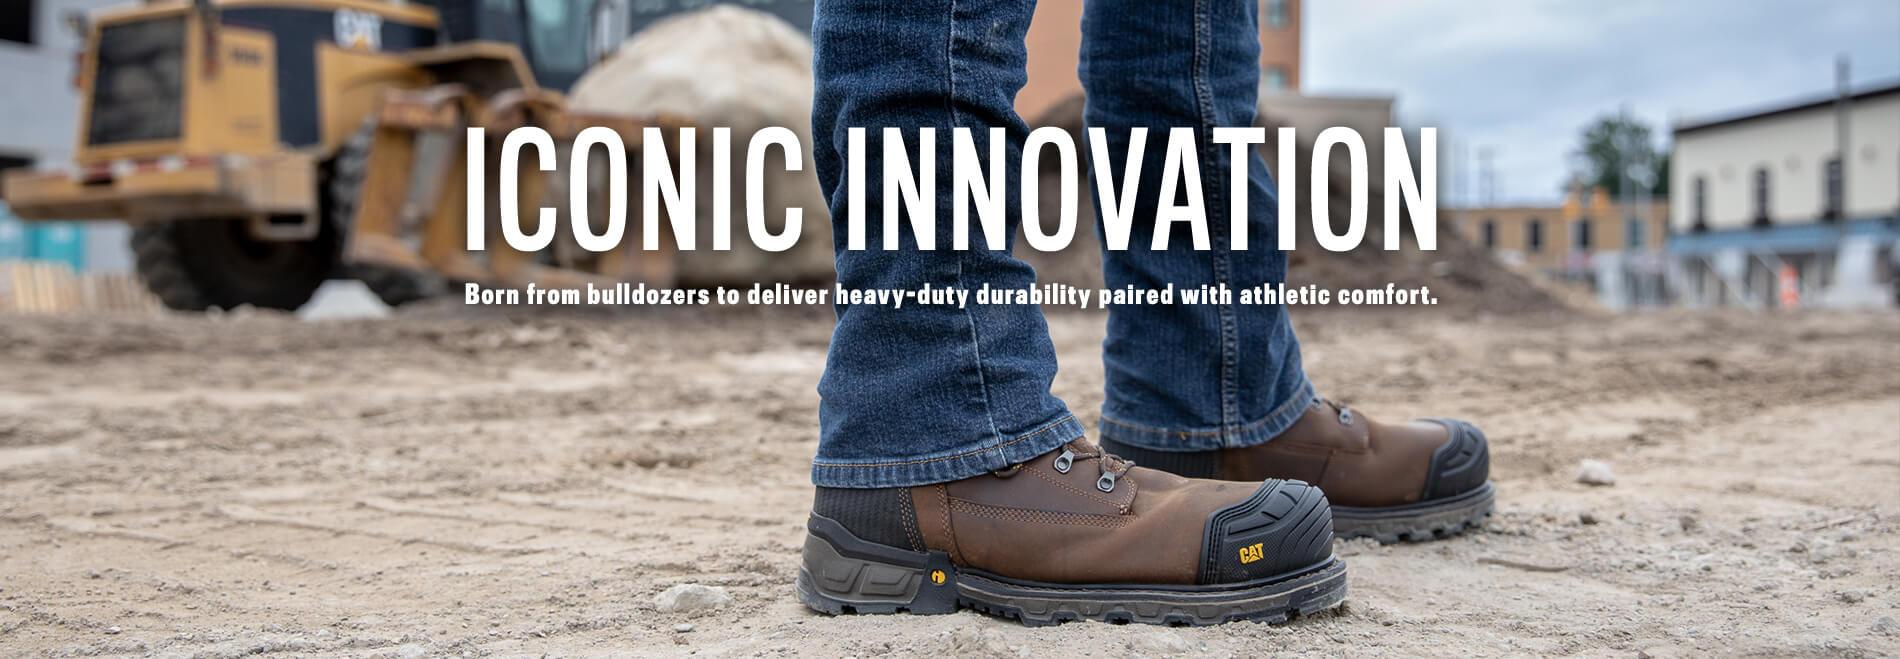 60ecad906648 CAT Footwear. Shop The Excavator. Iconic Innovation